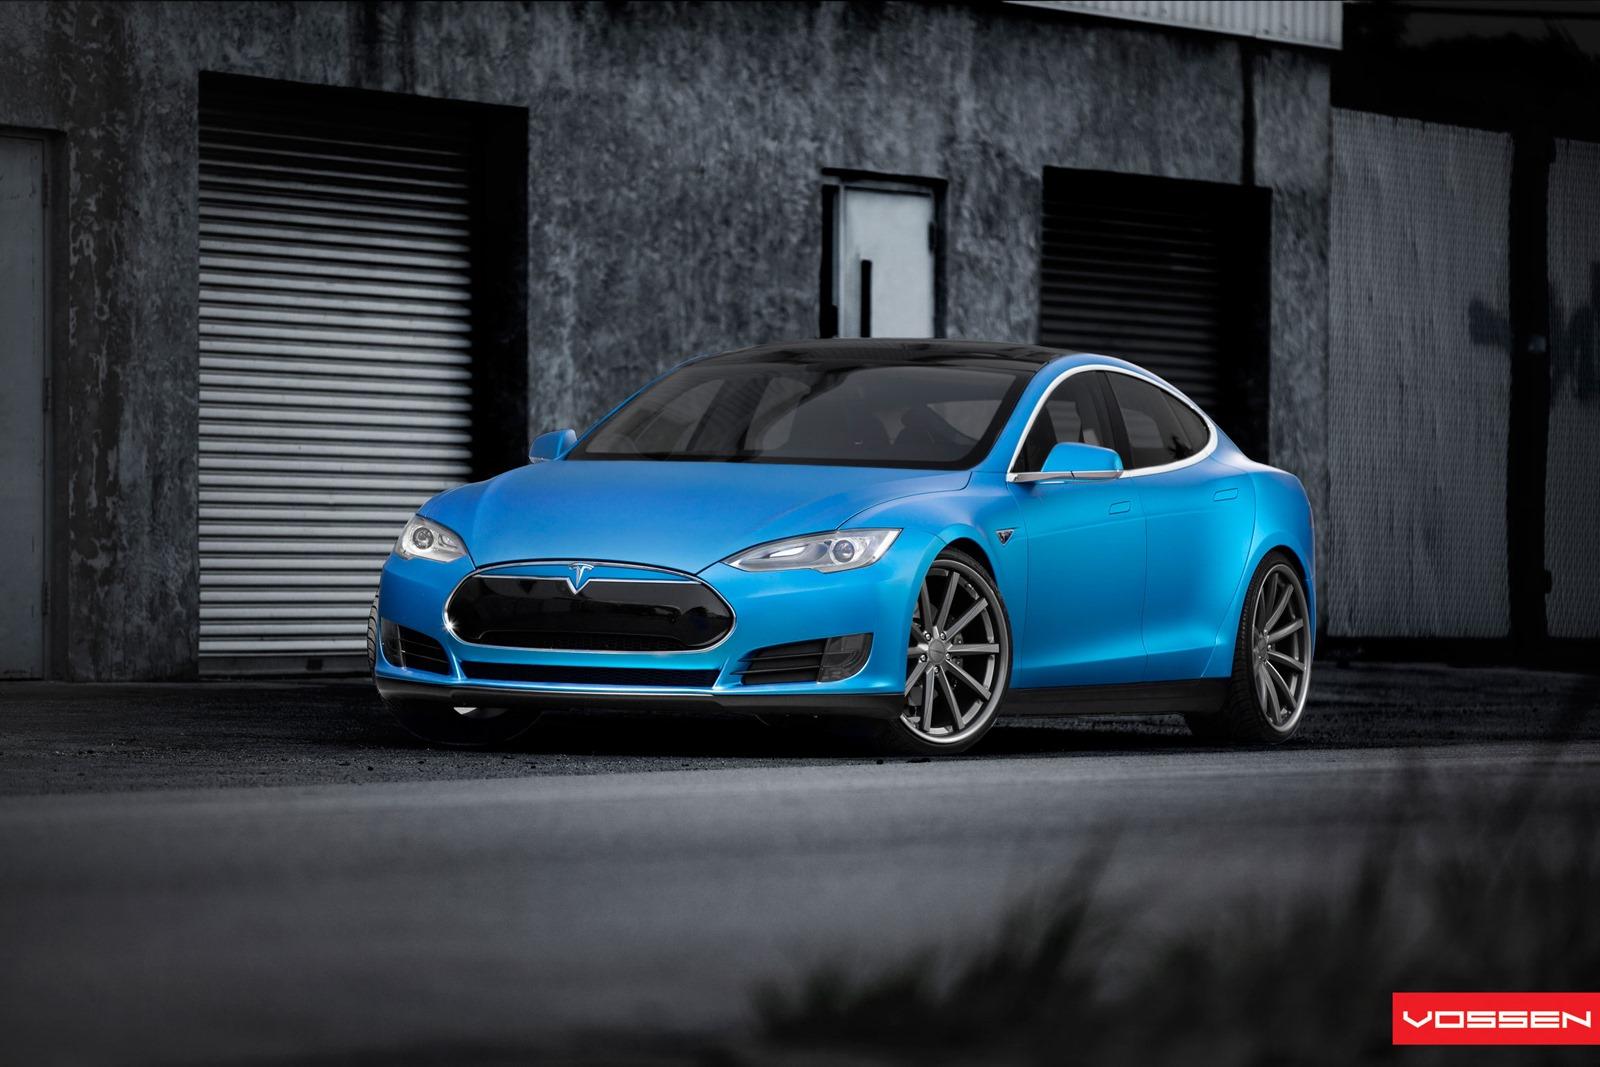 Cars For Sale Miami >> Gallery: Blue Tesla Model S on Vossen Wheels - GTspirit